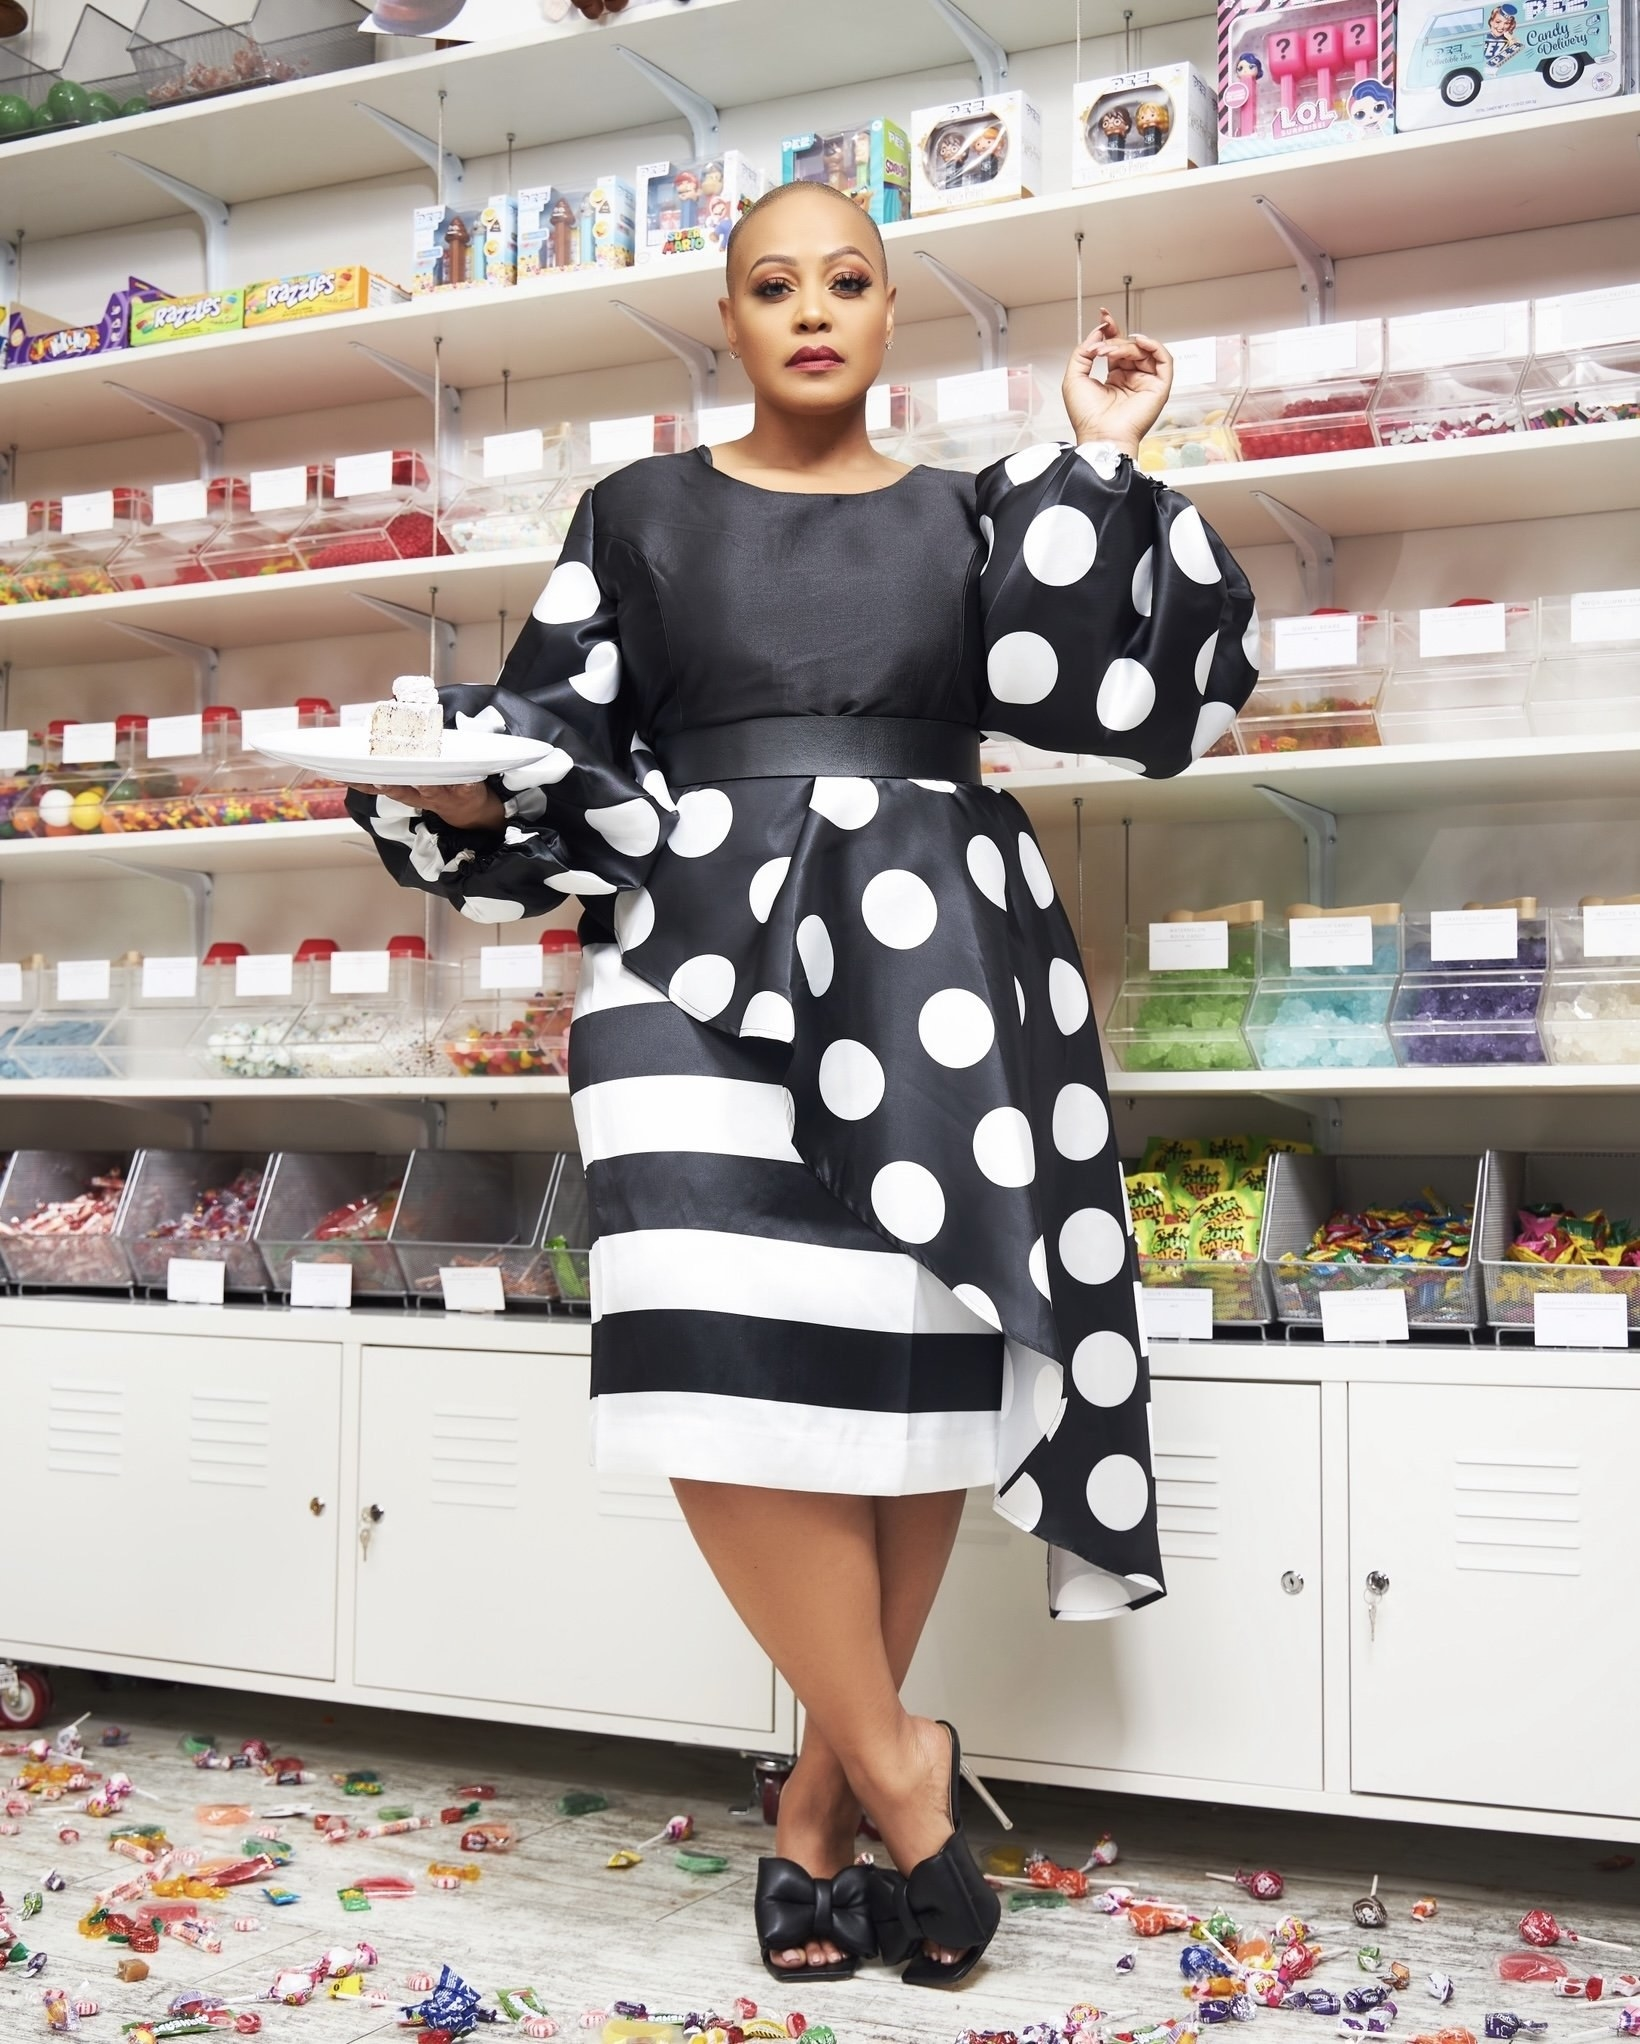 plus size model wearing a striped and polka dot dress